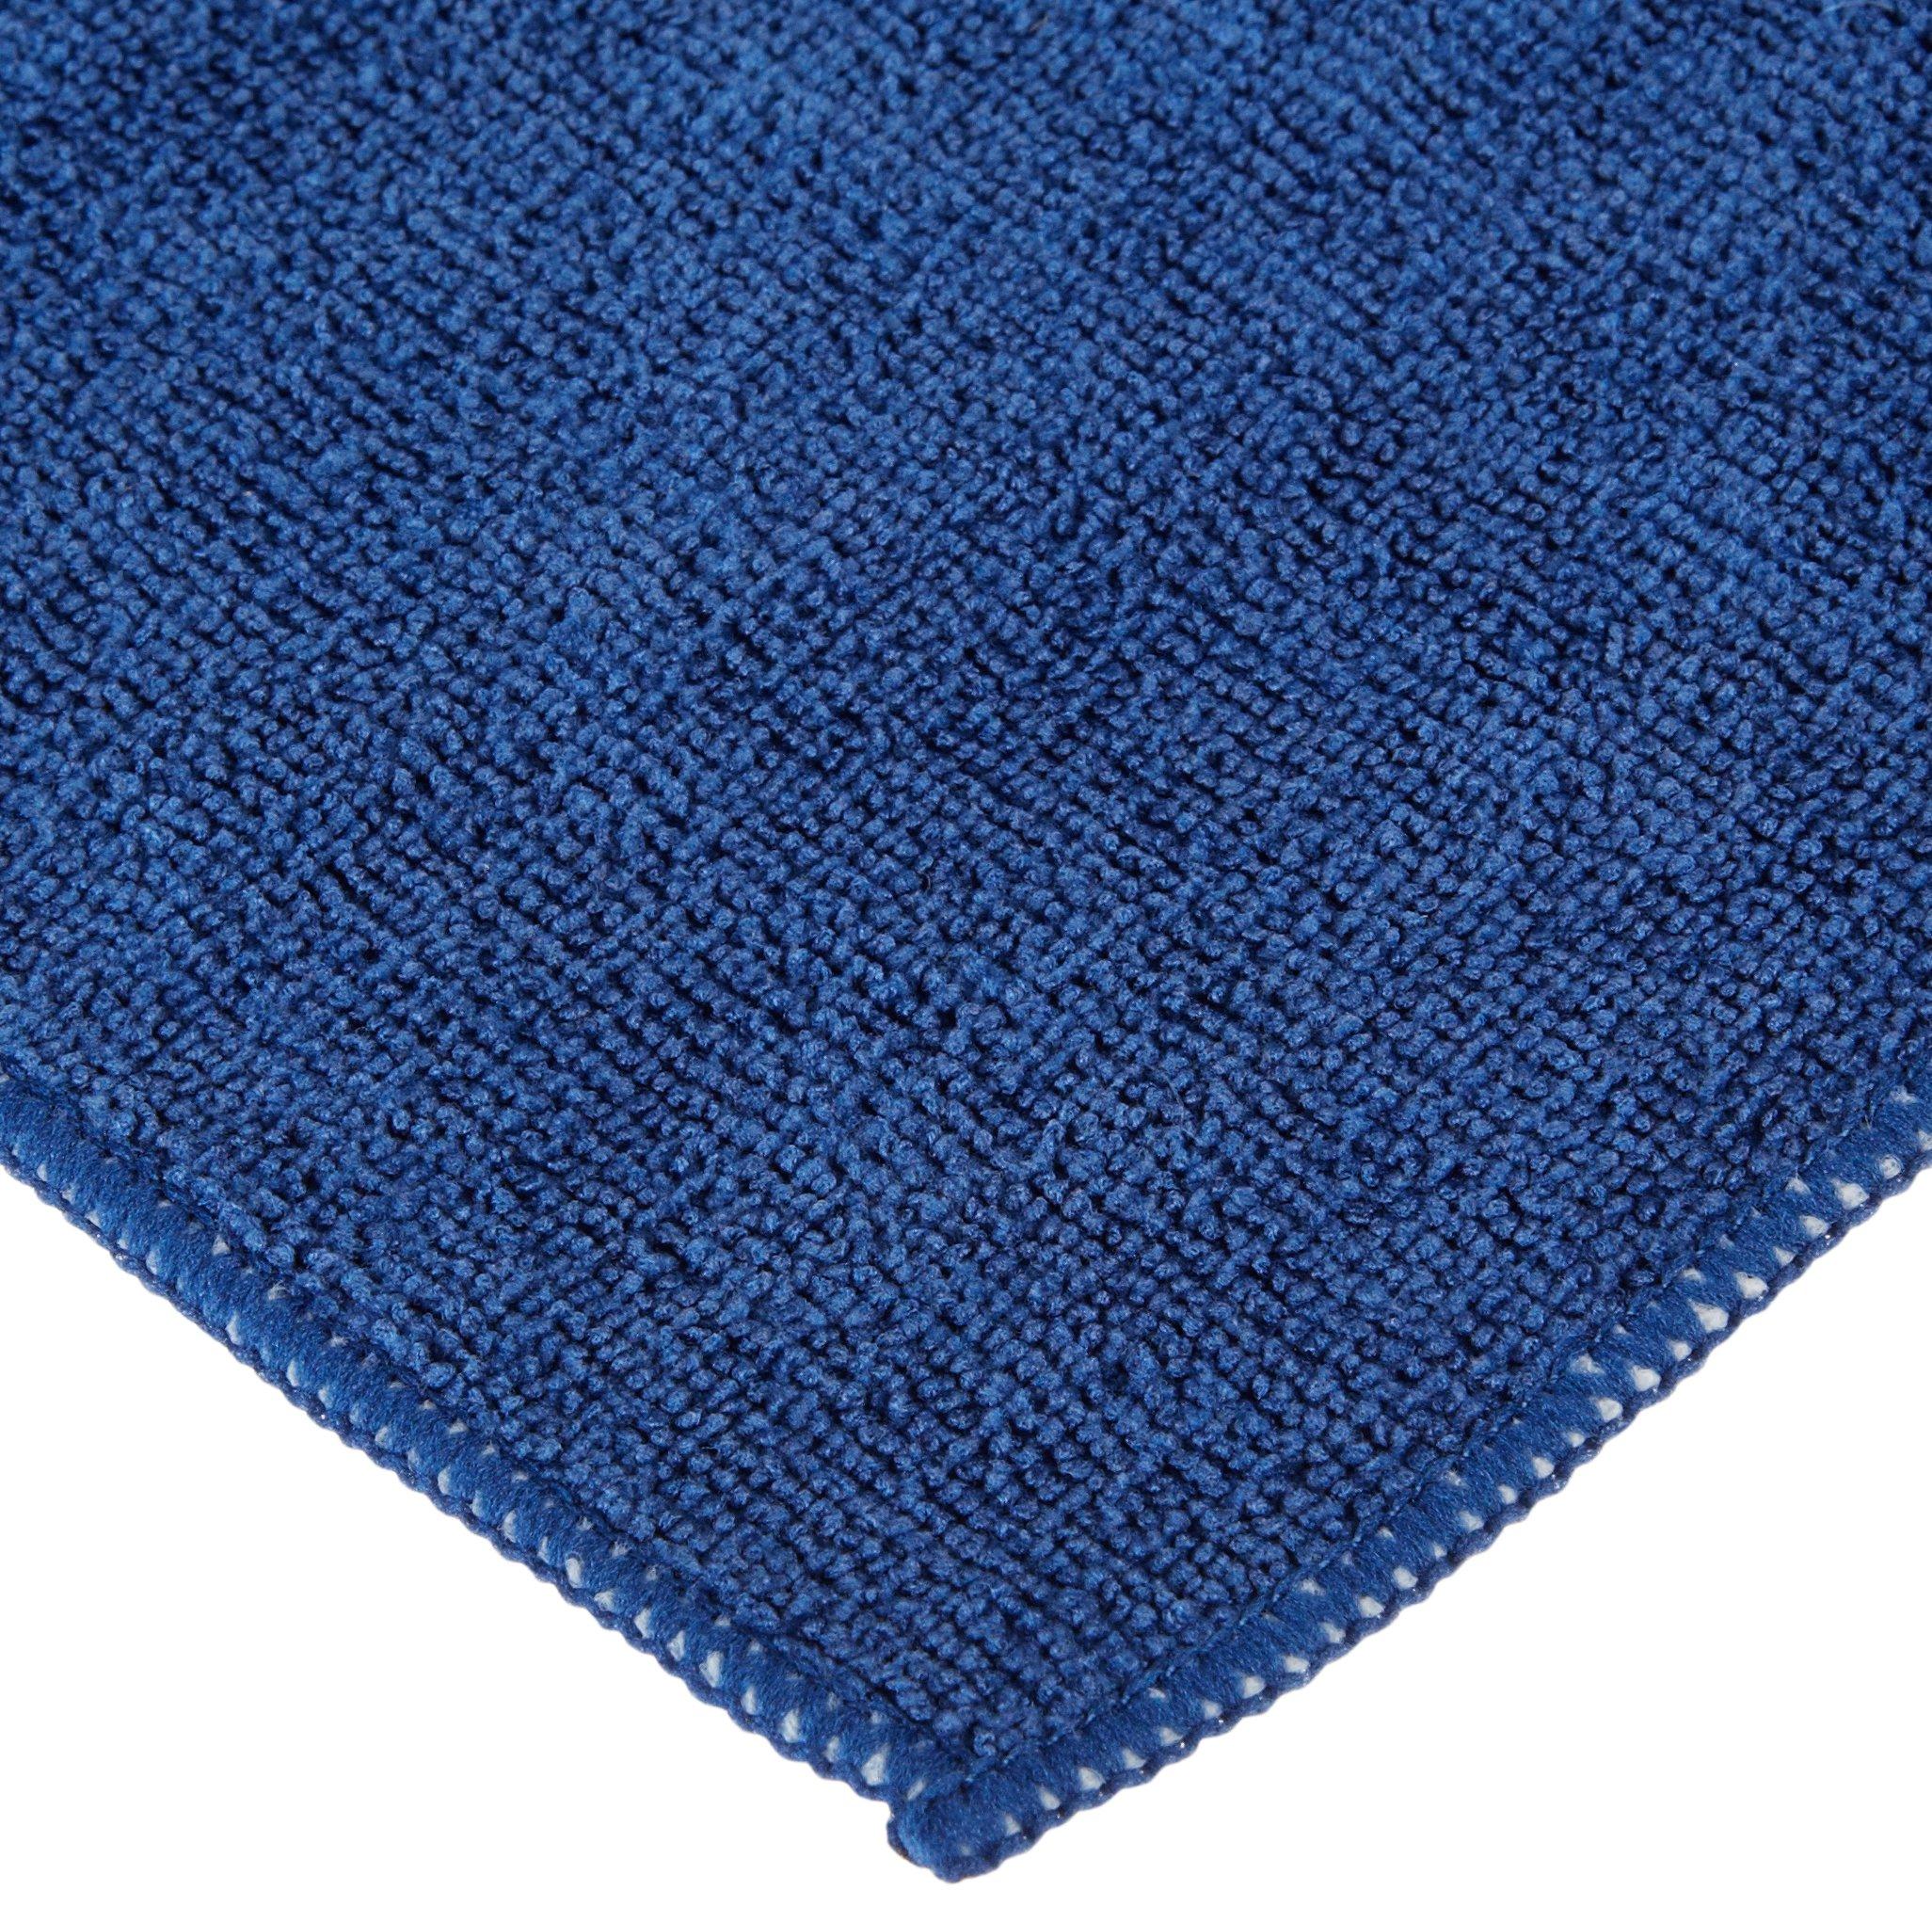 Wilen E871016, Supremo Microfiber Cloth, 16'' Length x 16'' Width, Navy Blue (Case of 180)